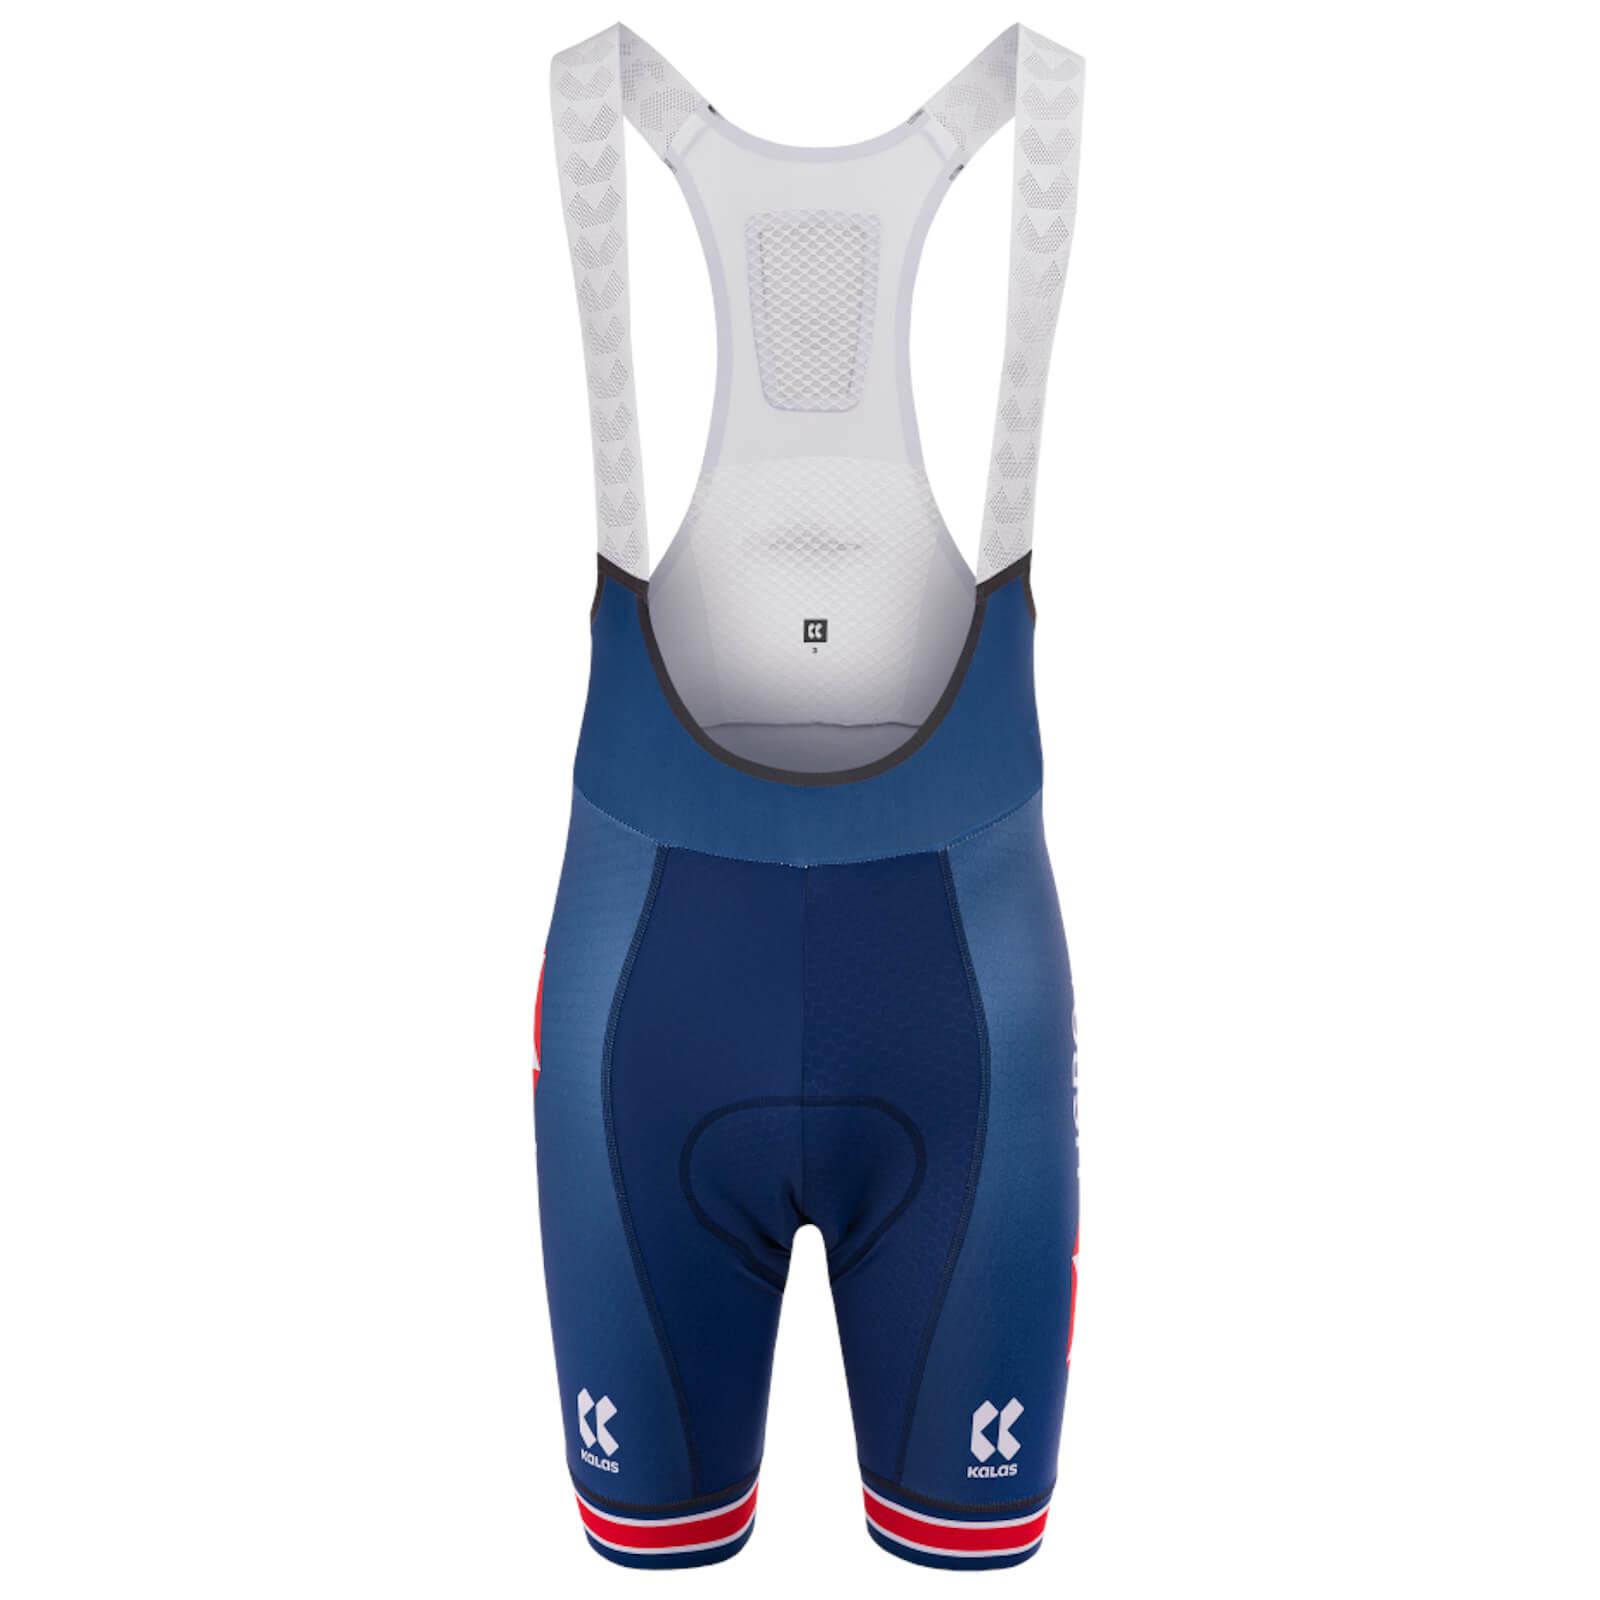 Kalas GBCT Pro Bib Shorts - Blue - XL